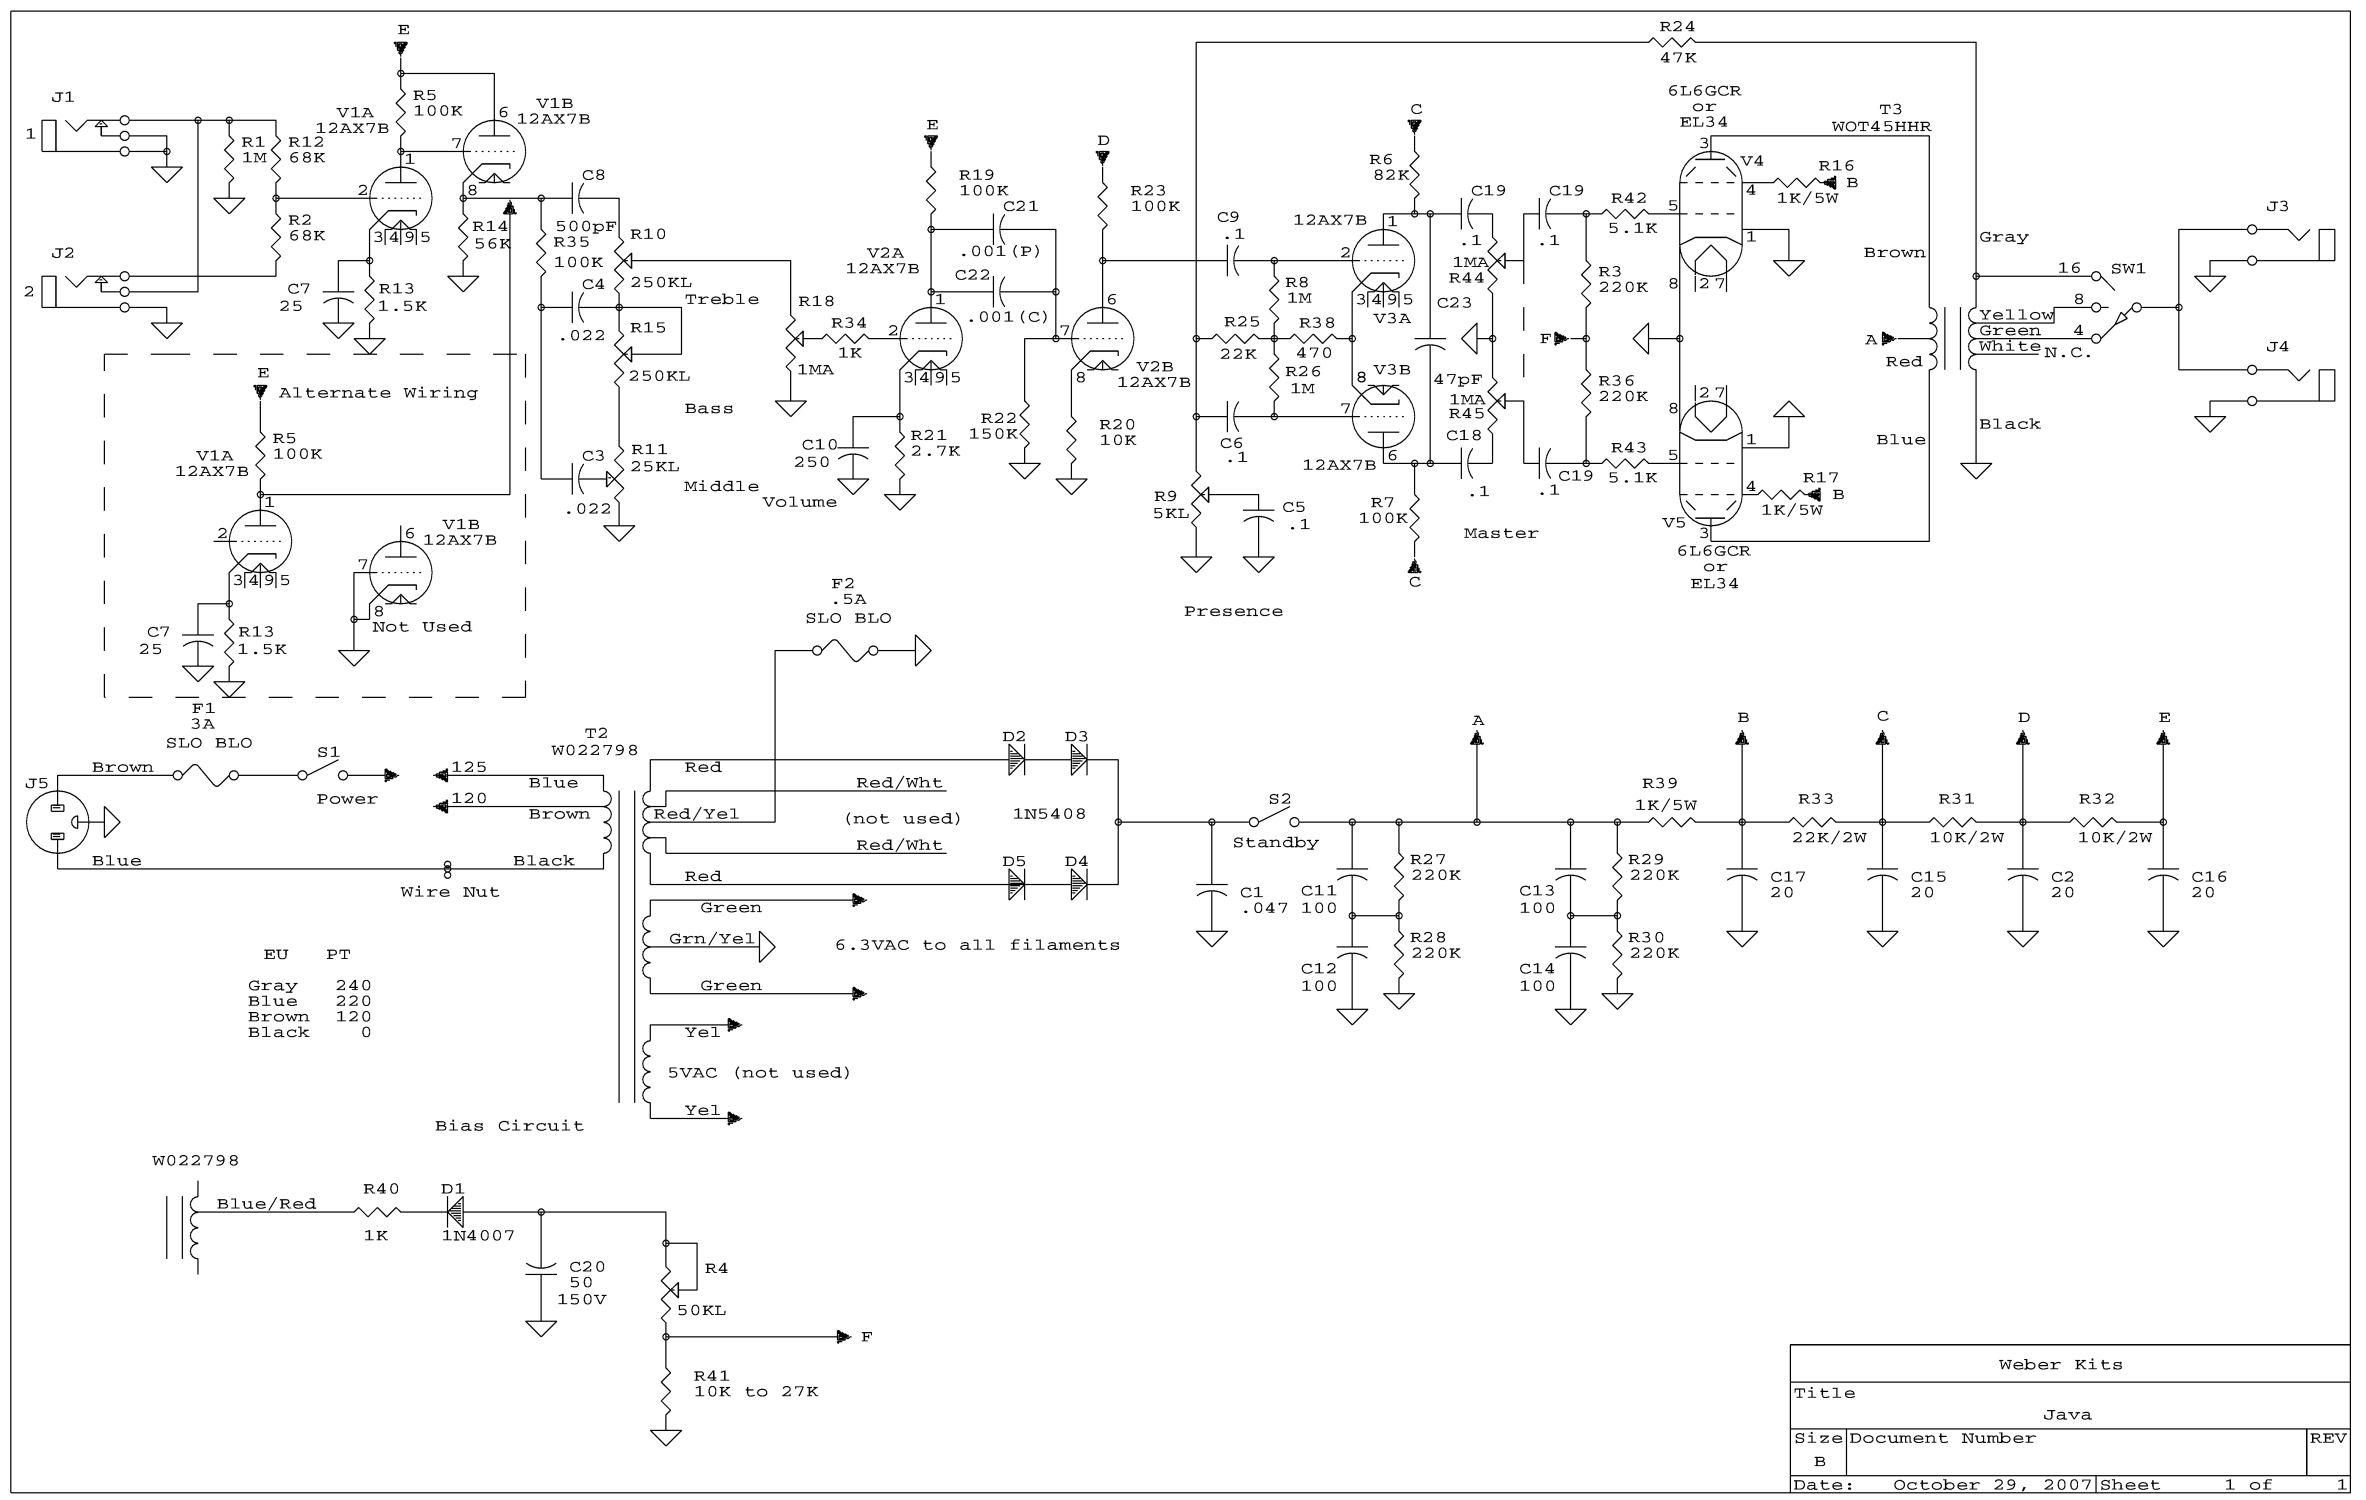 fender kurt cobain jaguar wiring diagram wiring diagram where can i a jag stang schematic wiring diagram fender jaguar wiring diagram on kurt cobain source